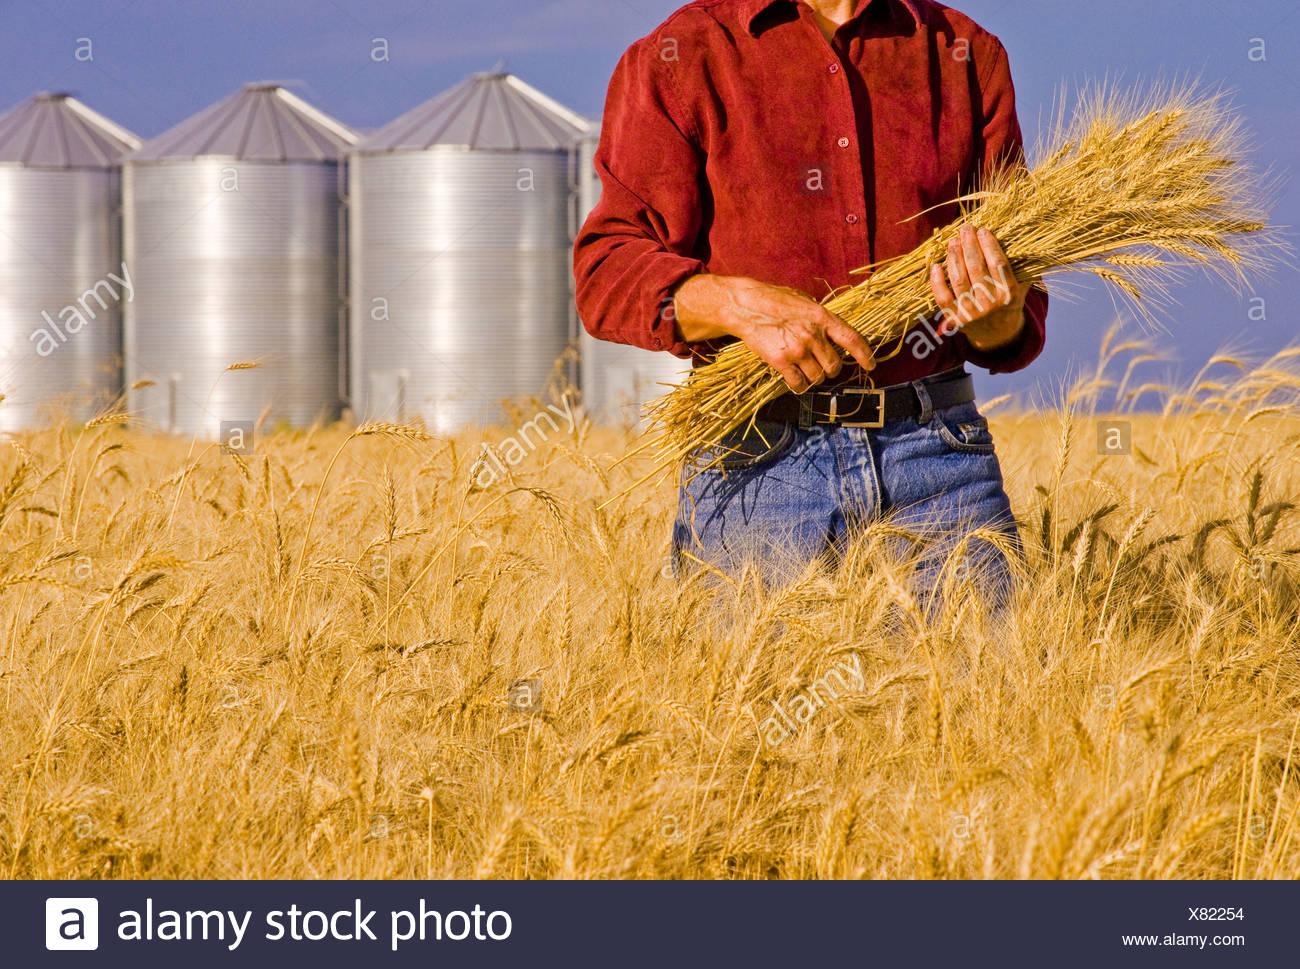 A farmer holds mature winter wheat, grain bins in the background, near Carey, Manitoba, Canada - Stock Image